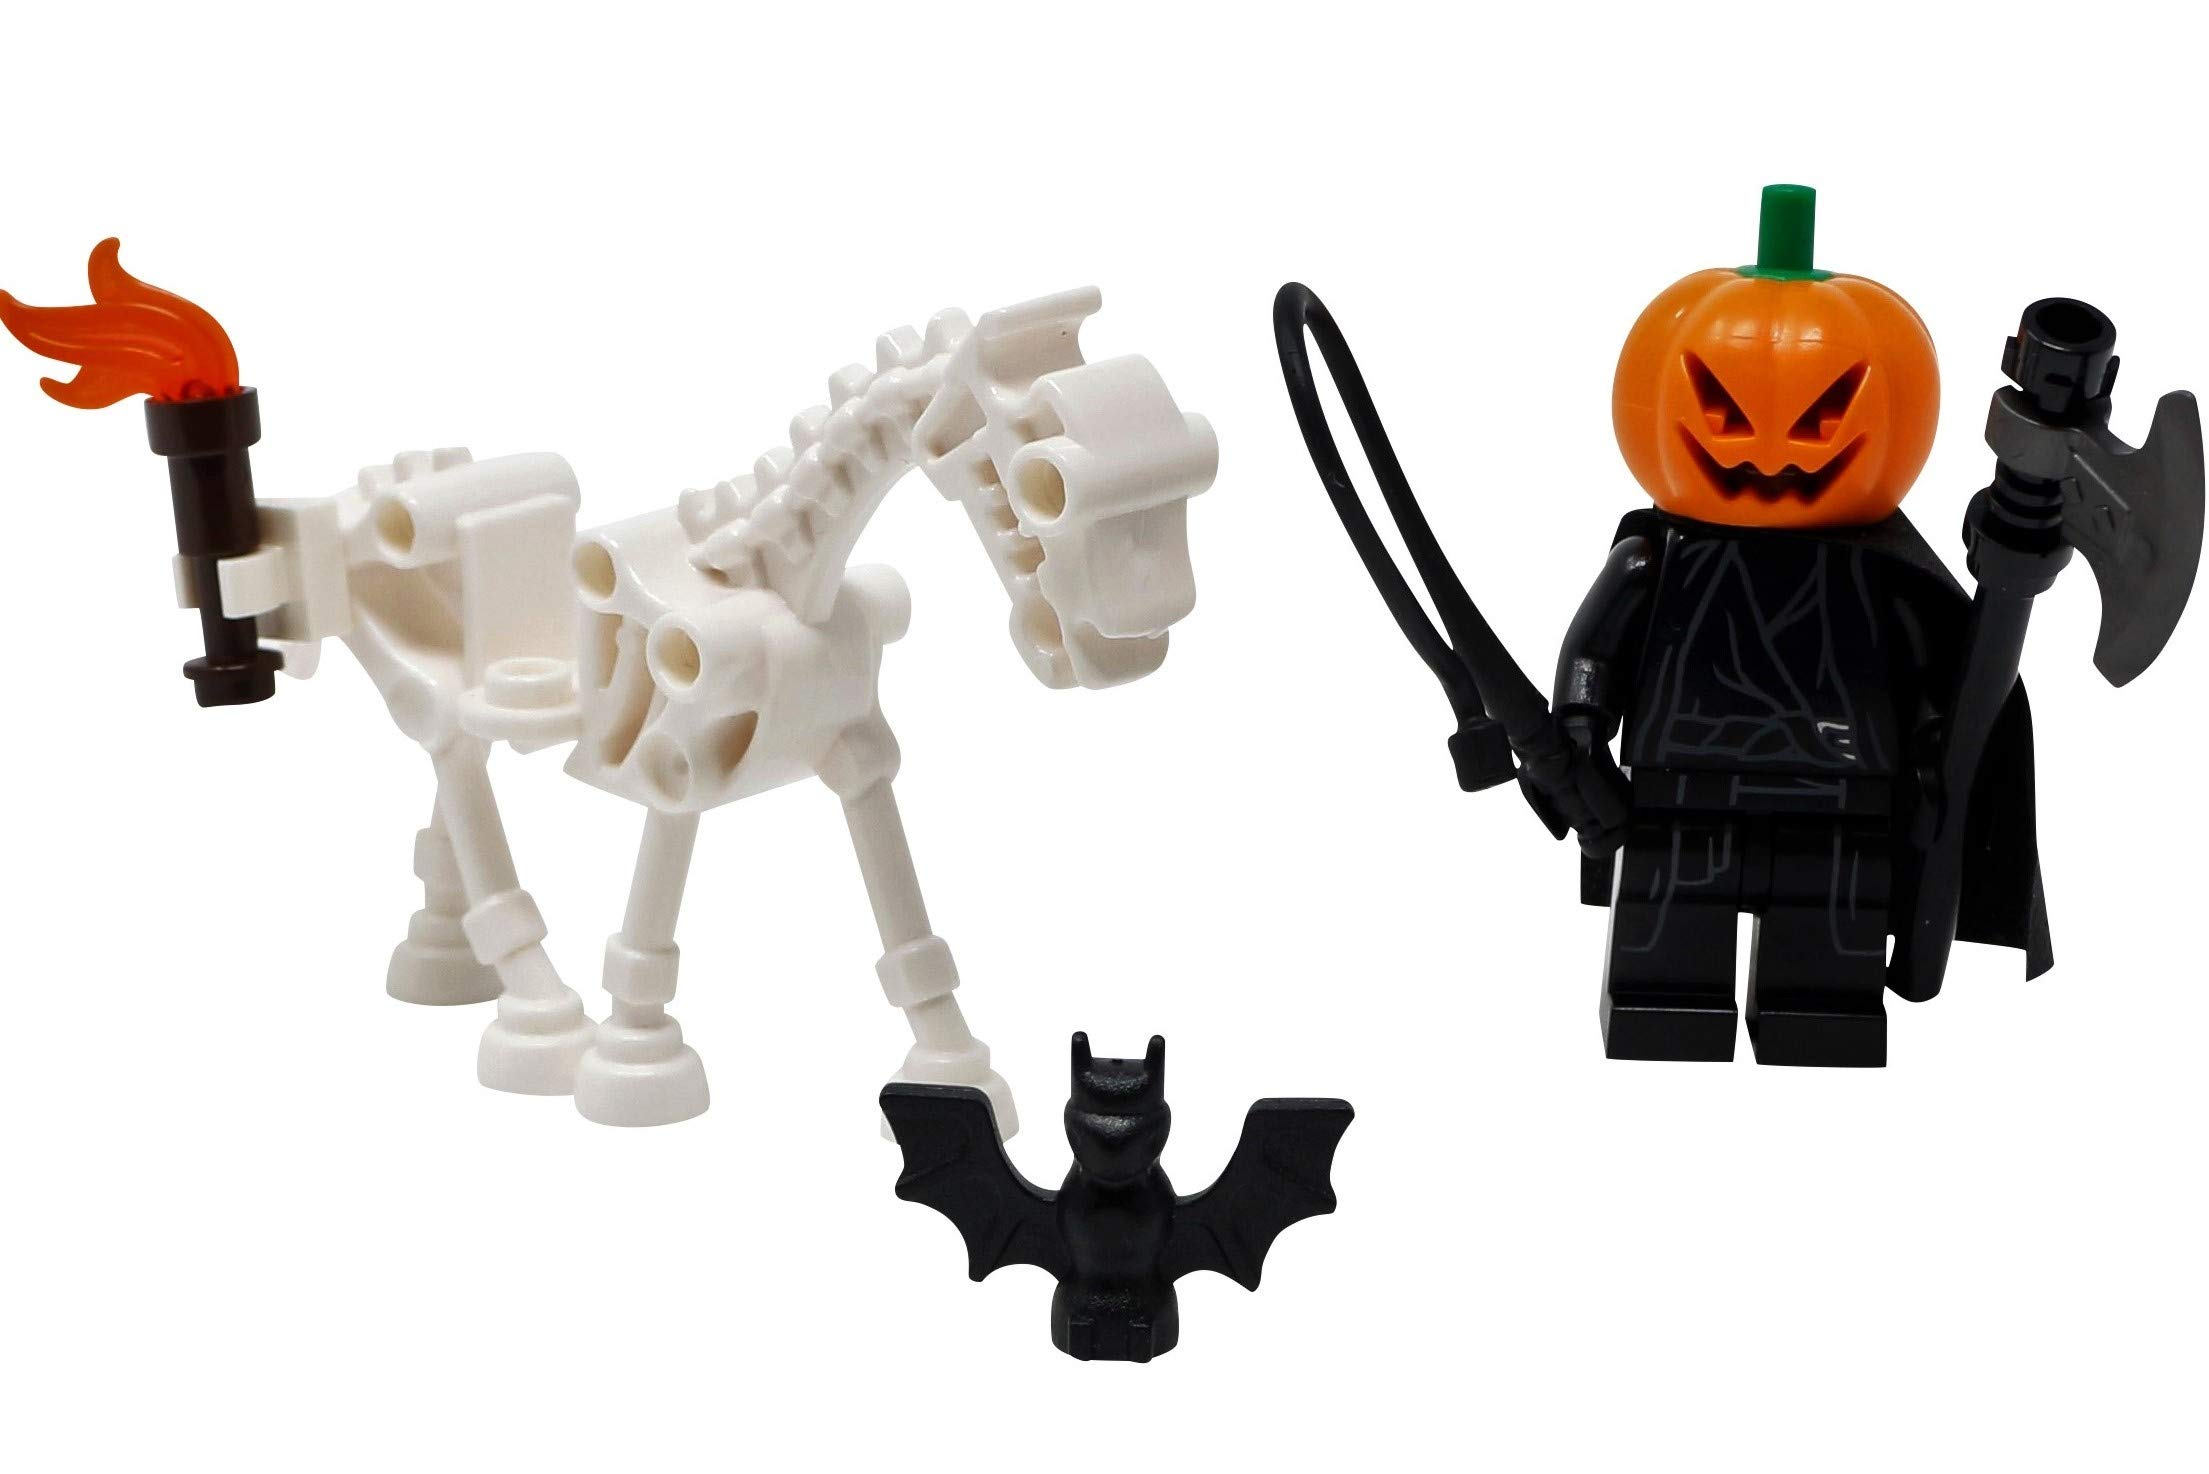 Lego Headless Horseman Legend of Sleepy Hollow Creepy Halloween Minifigure